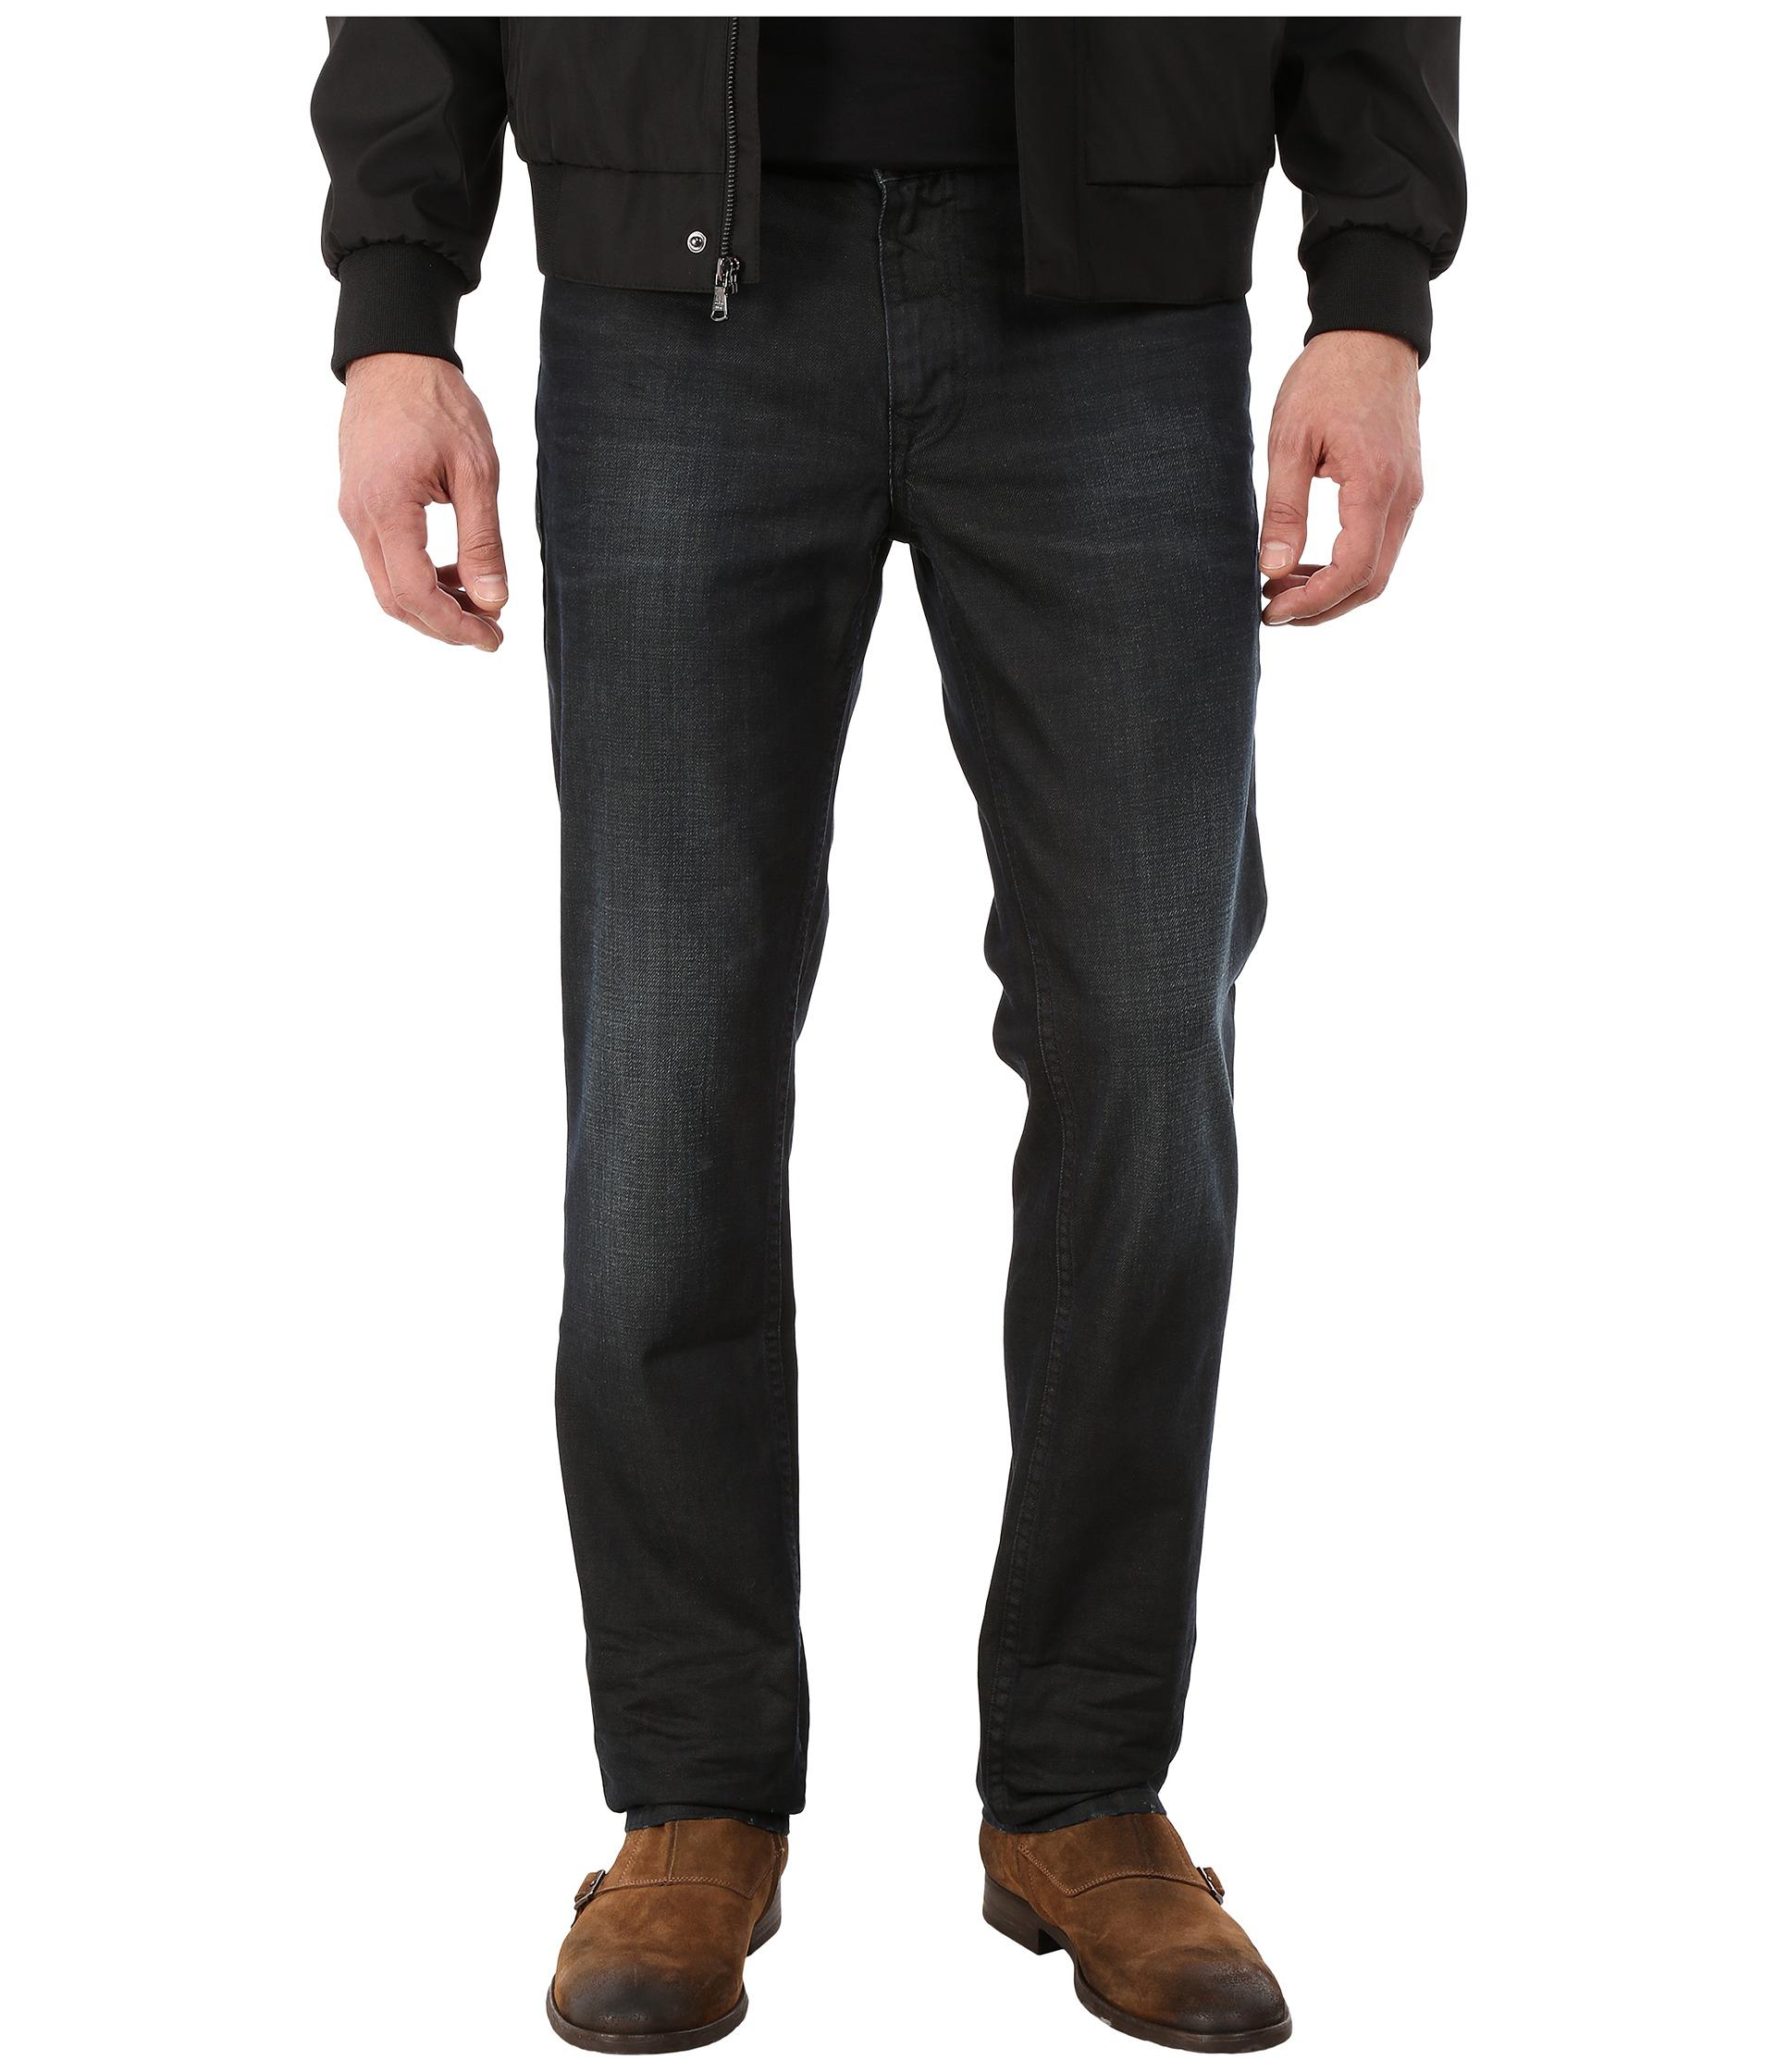 calvin klein jeans velocity black slim denim straight. Black Bedroom Furniture Sets. Home Design Ideas